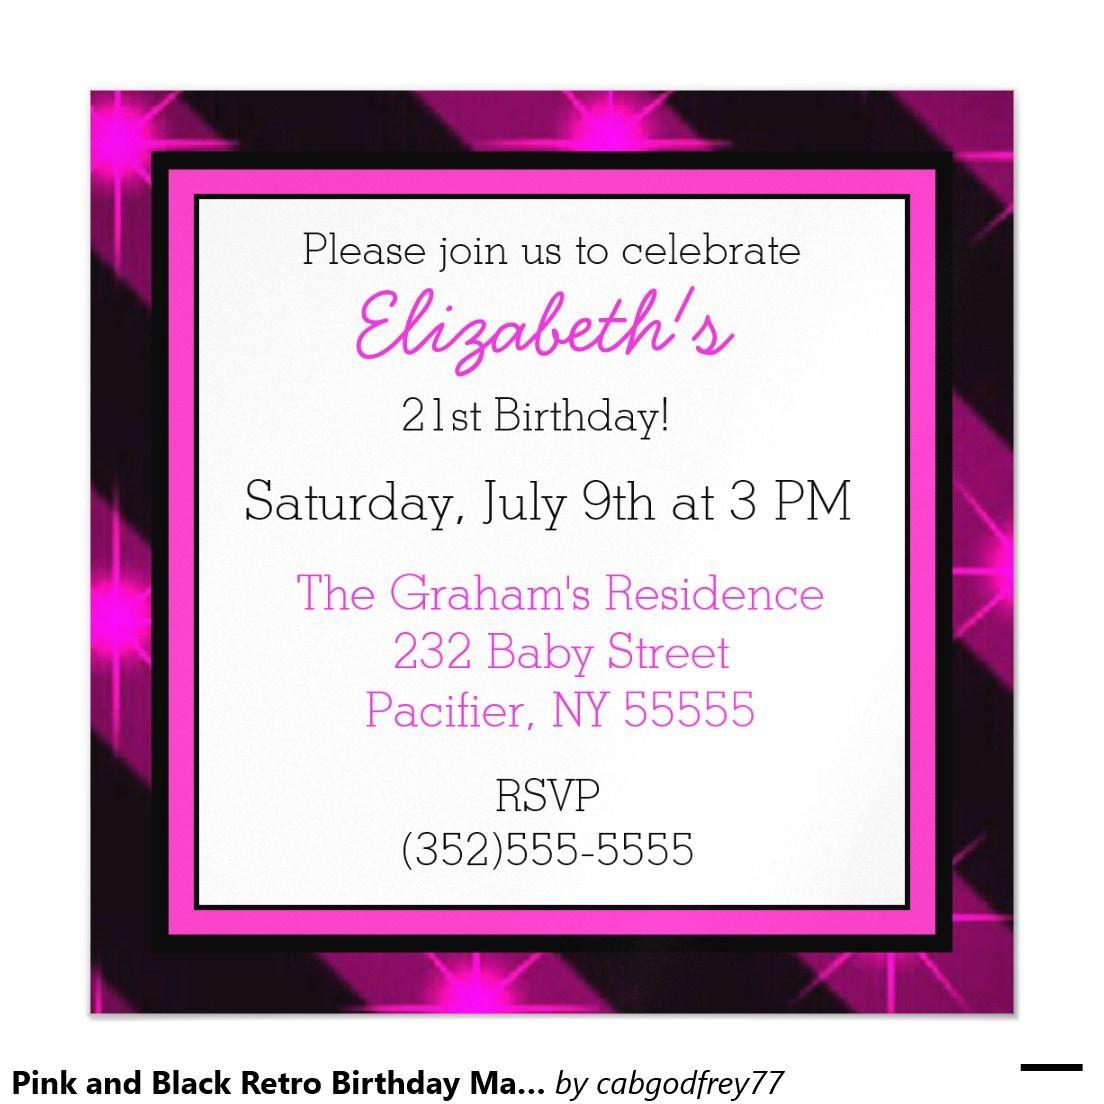 Pink and black retro birthday magnetic invitation retro birthday pink and black retro birthday magnetic invitation filmwisefo